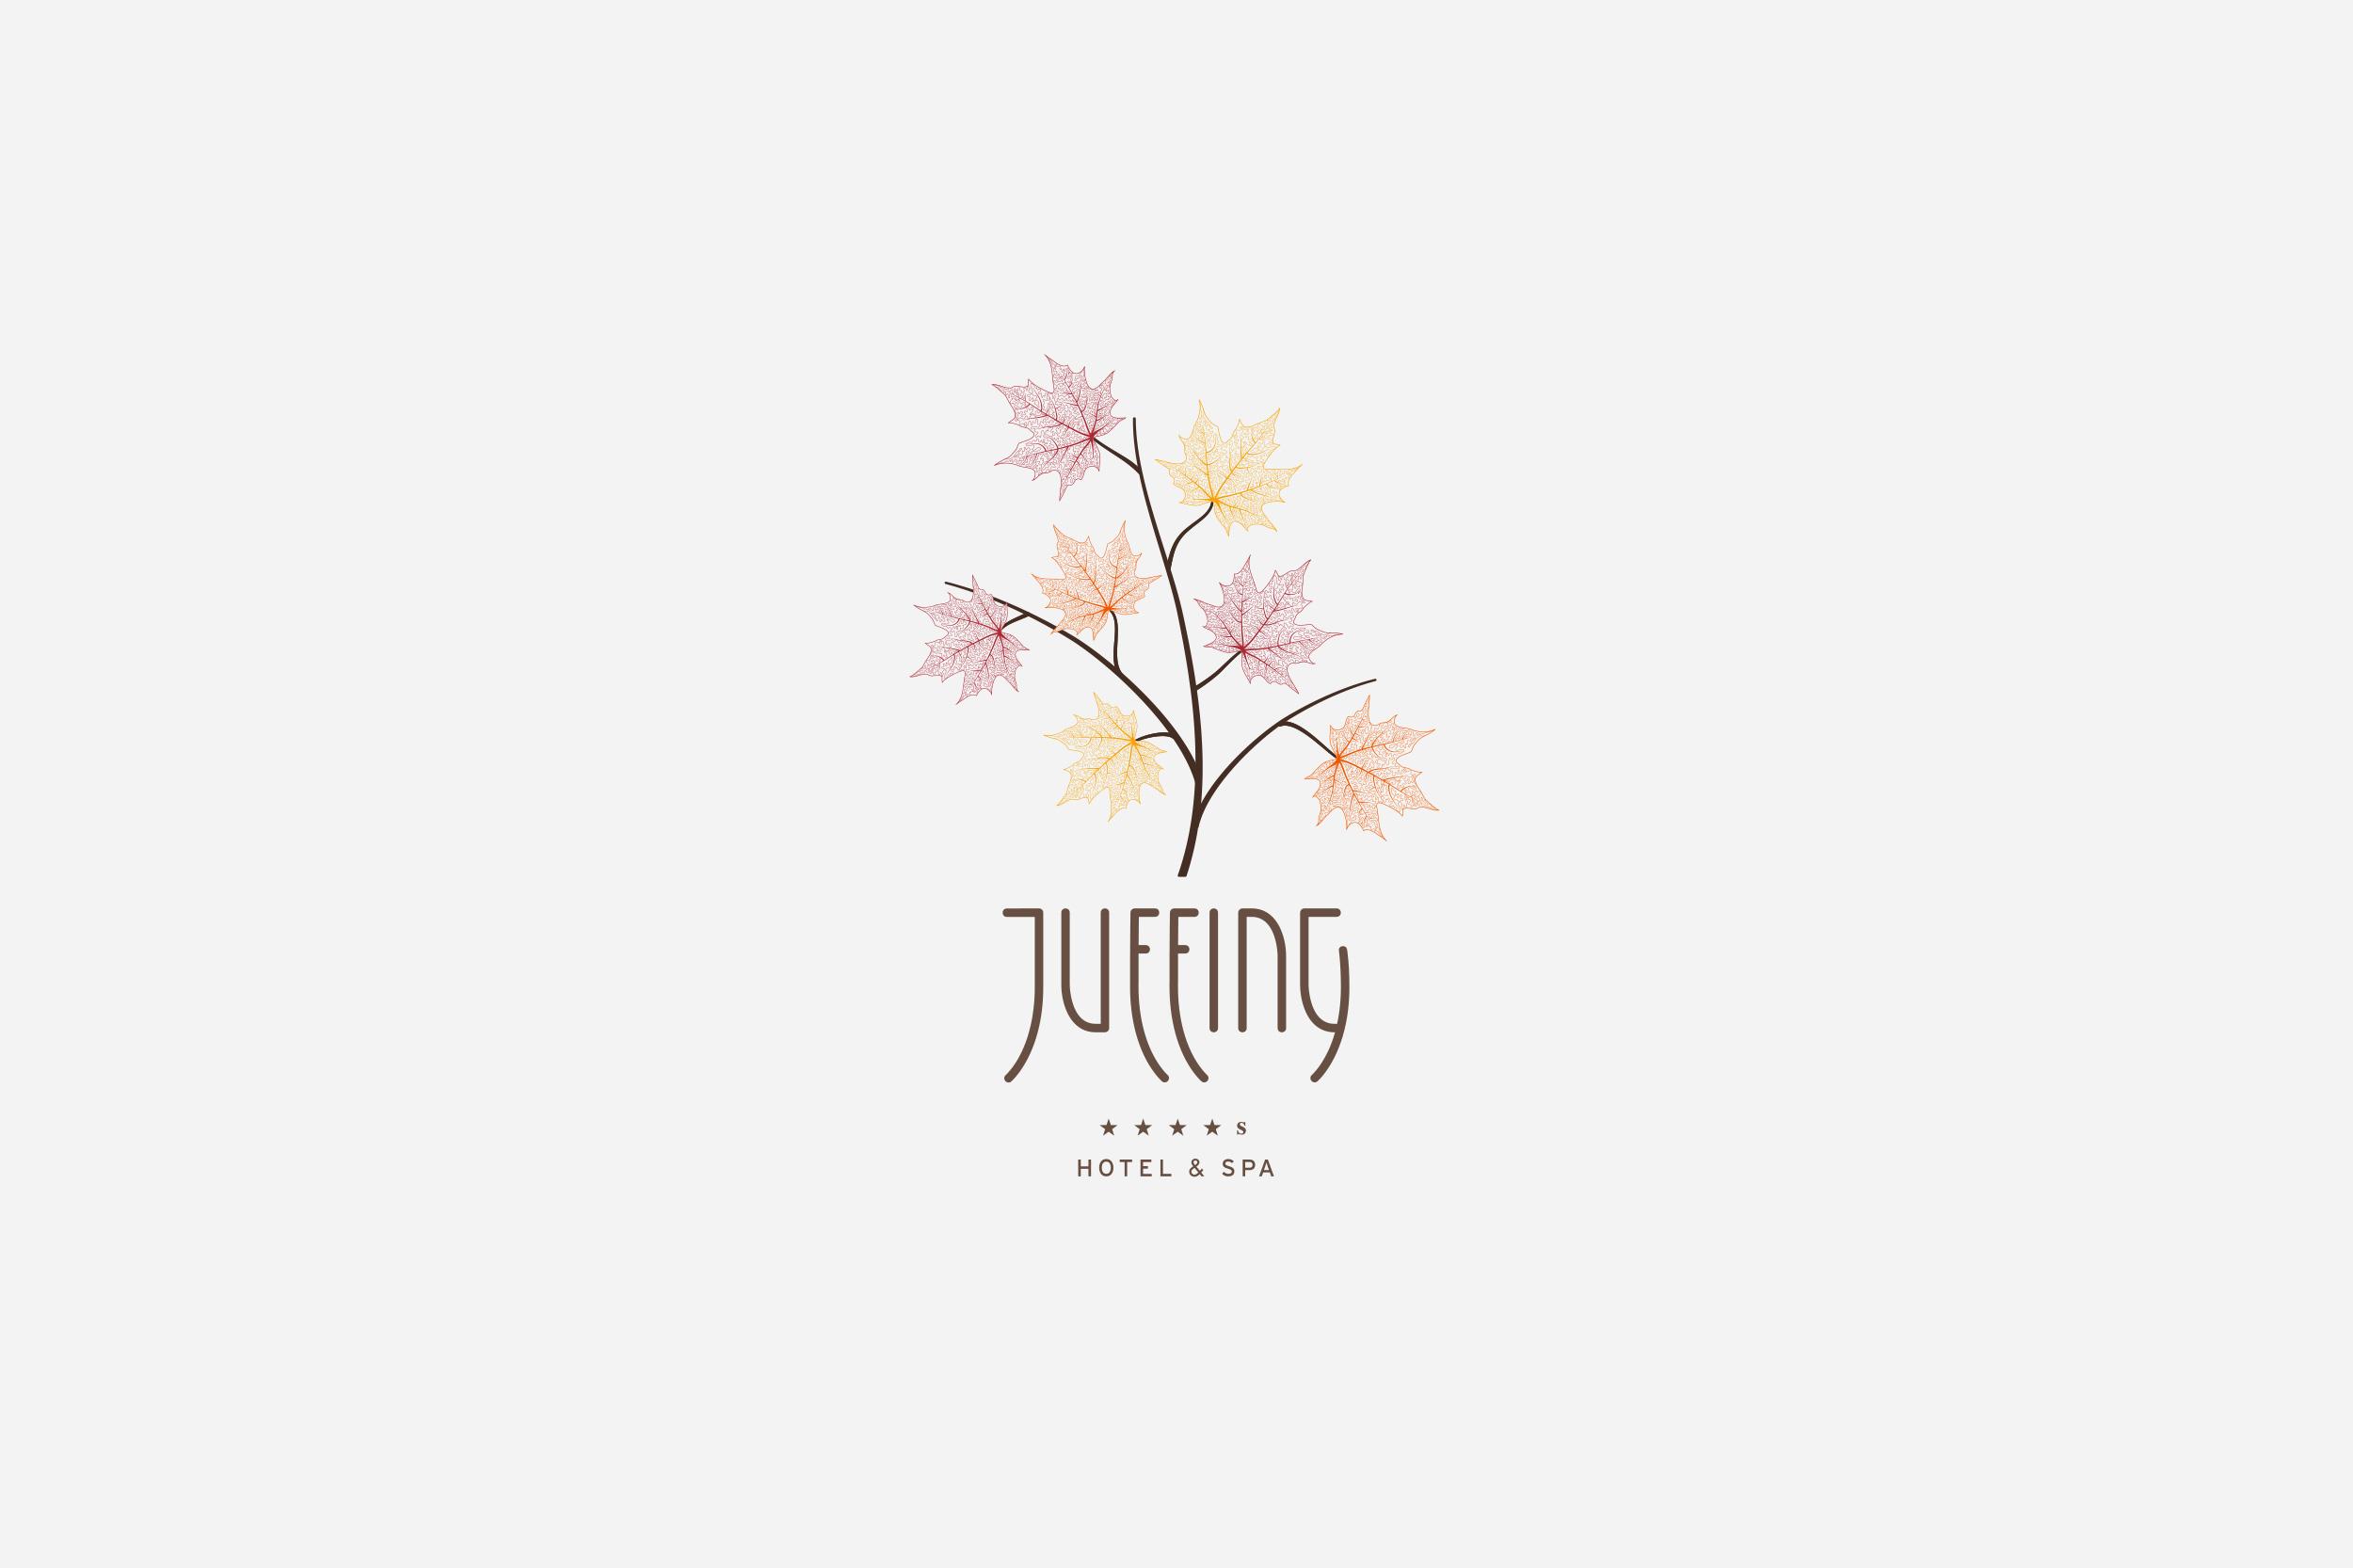 juffing_01.jpg